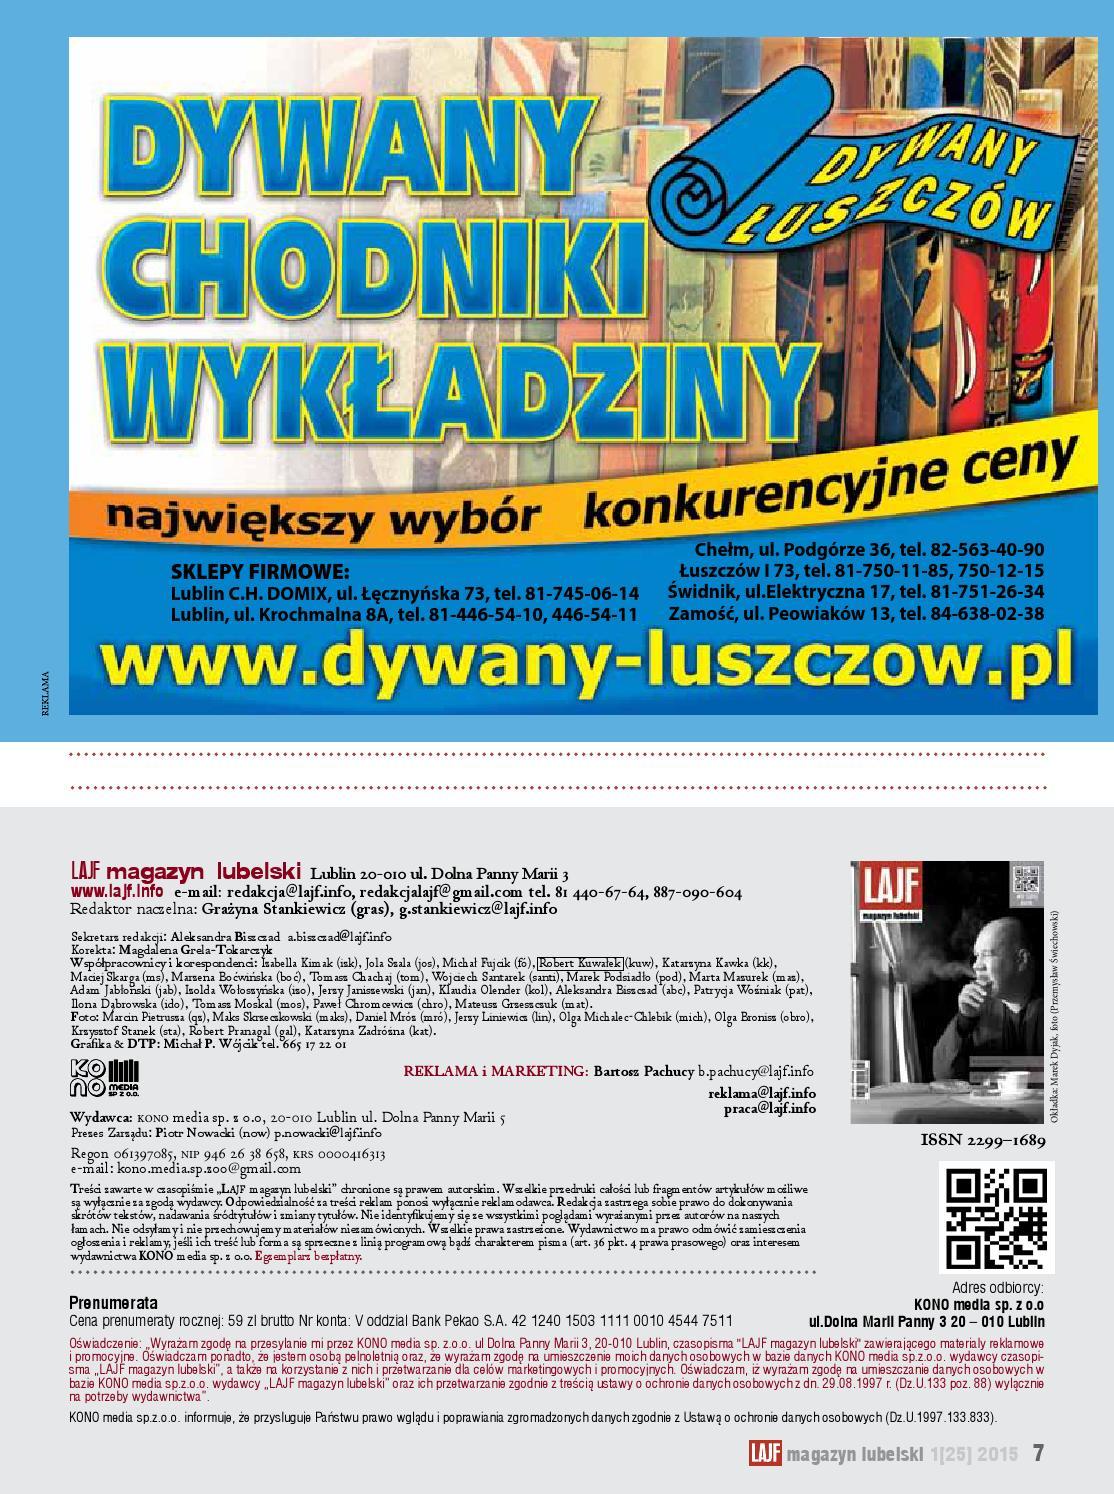 Lajf Magazyn Lubelski 25 By Lajf Magazyn Lubelski Issuu